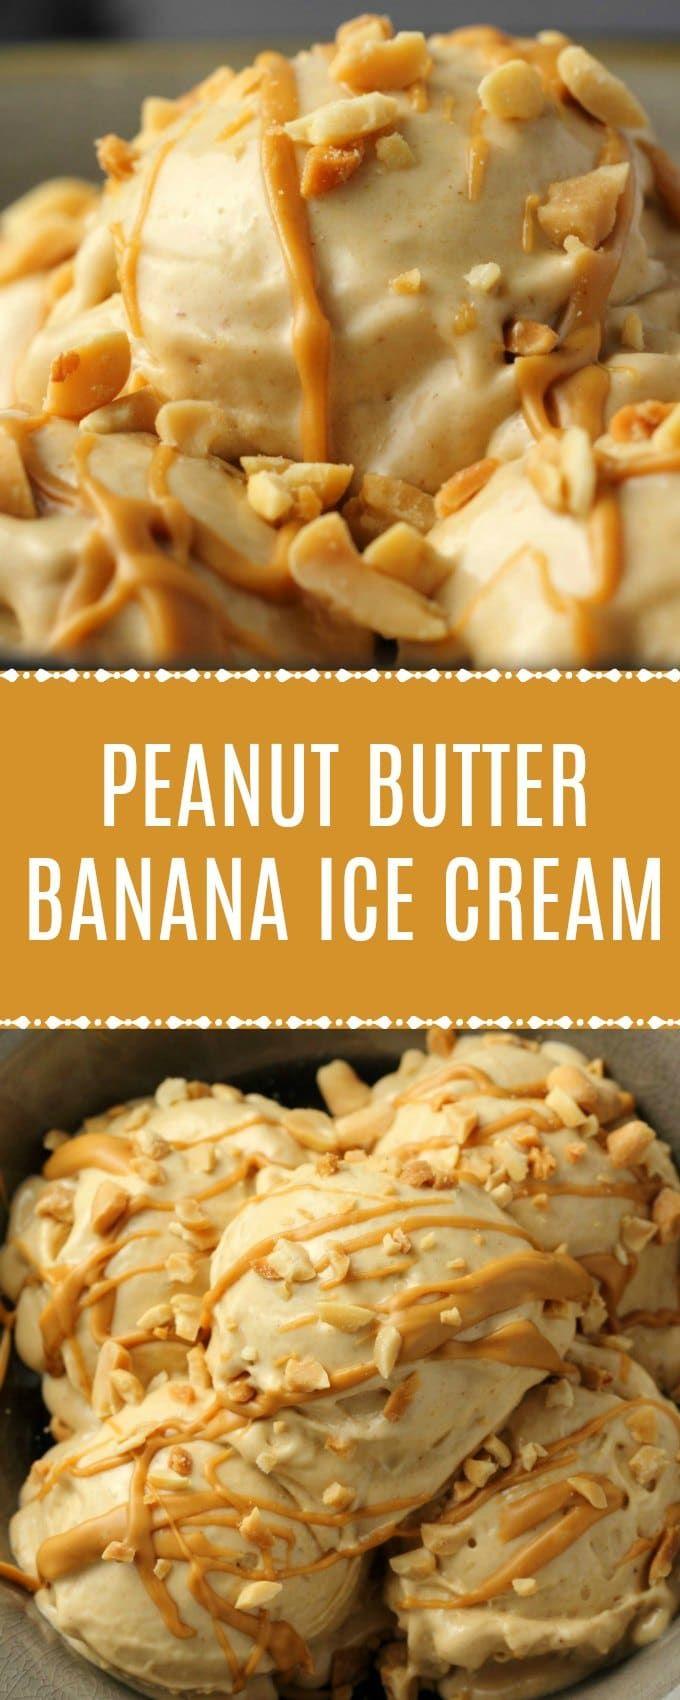 Peanut Butter Banana Ice Cream – 2 Ingredients